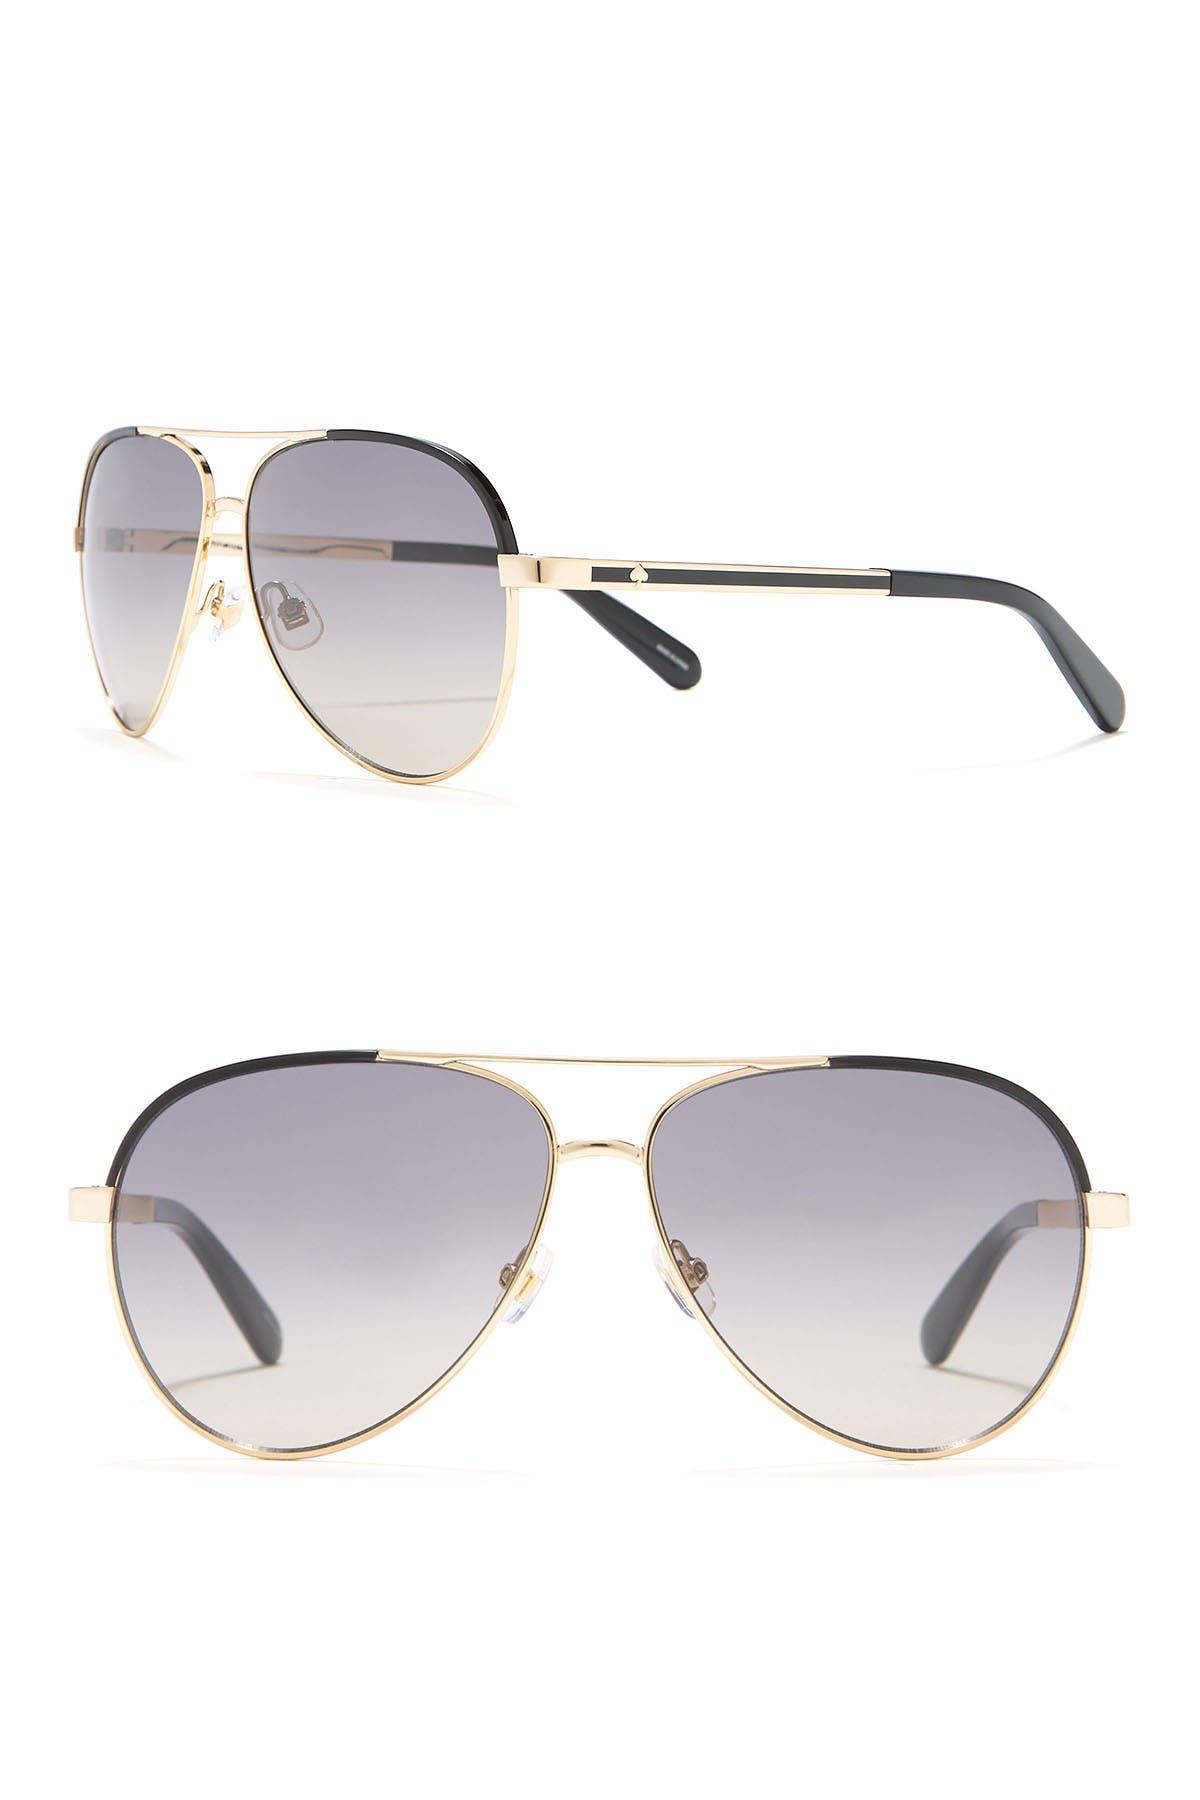 Image of kate spade new york amarissa 59mm aviator sunglasses